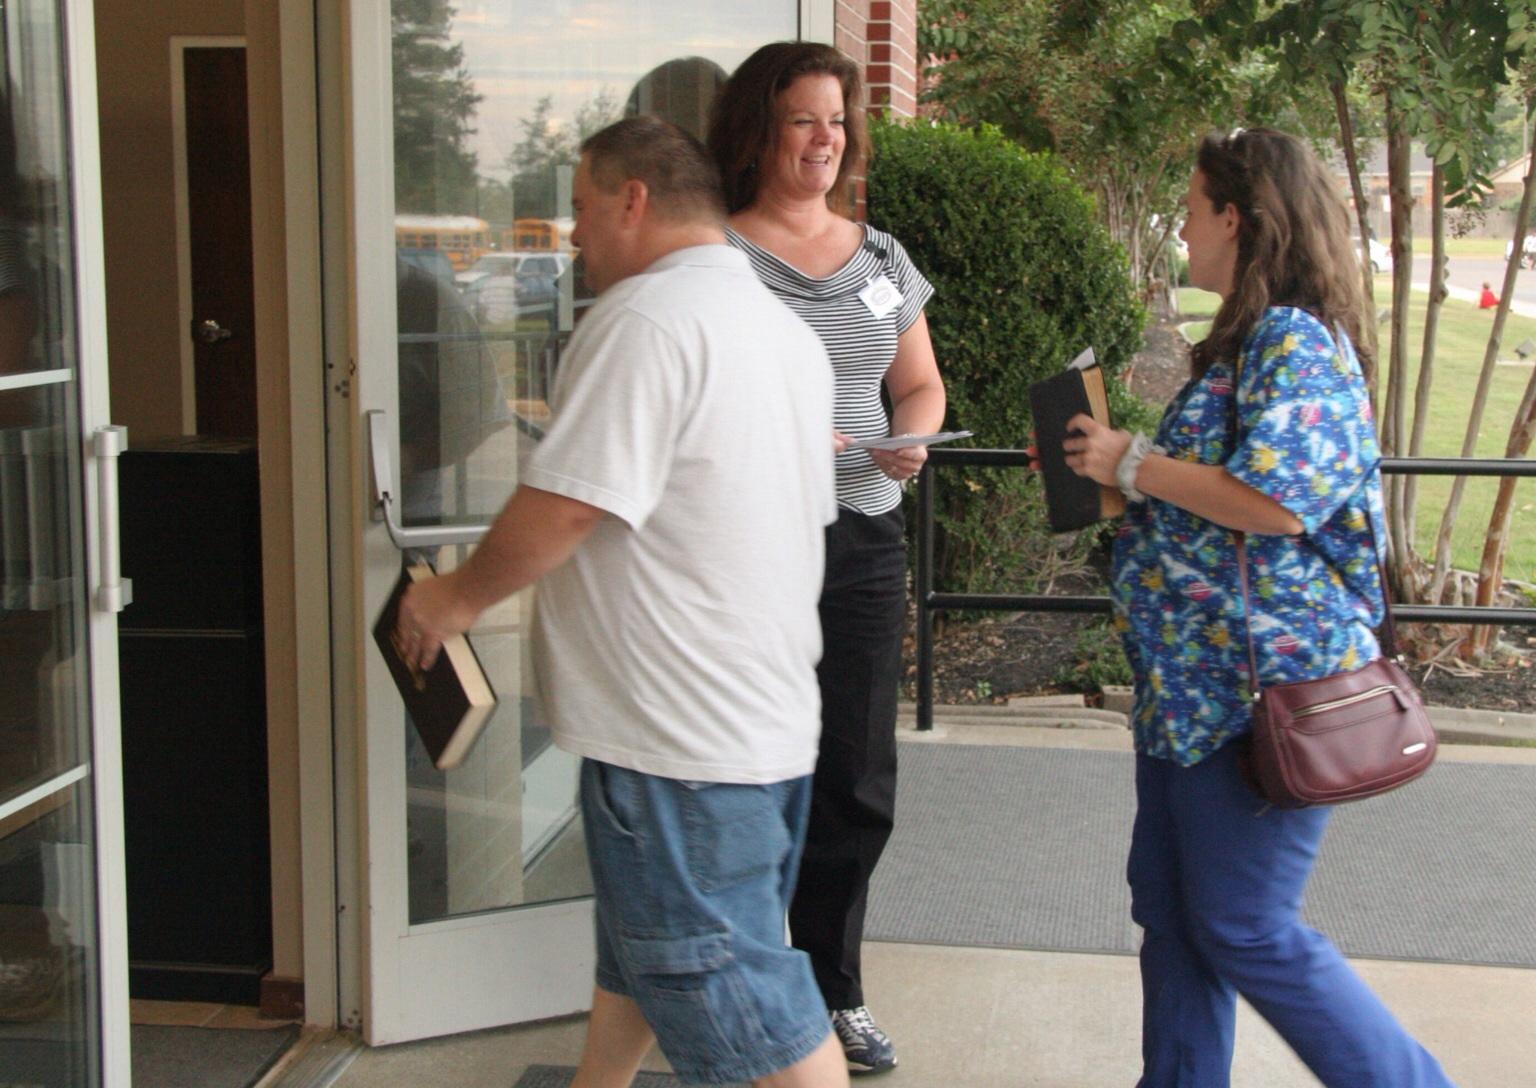 Study: Ignoring visitors may hurt church attendance